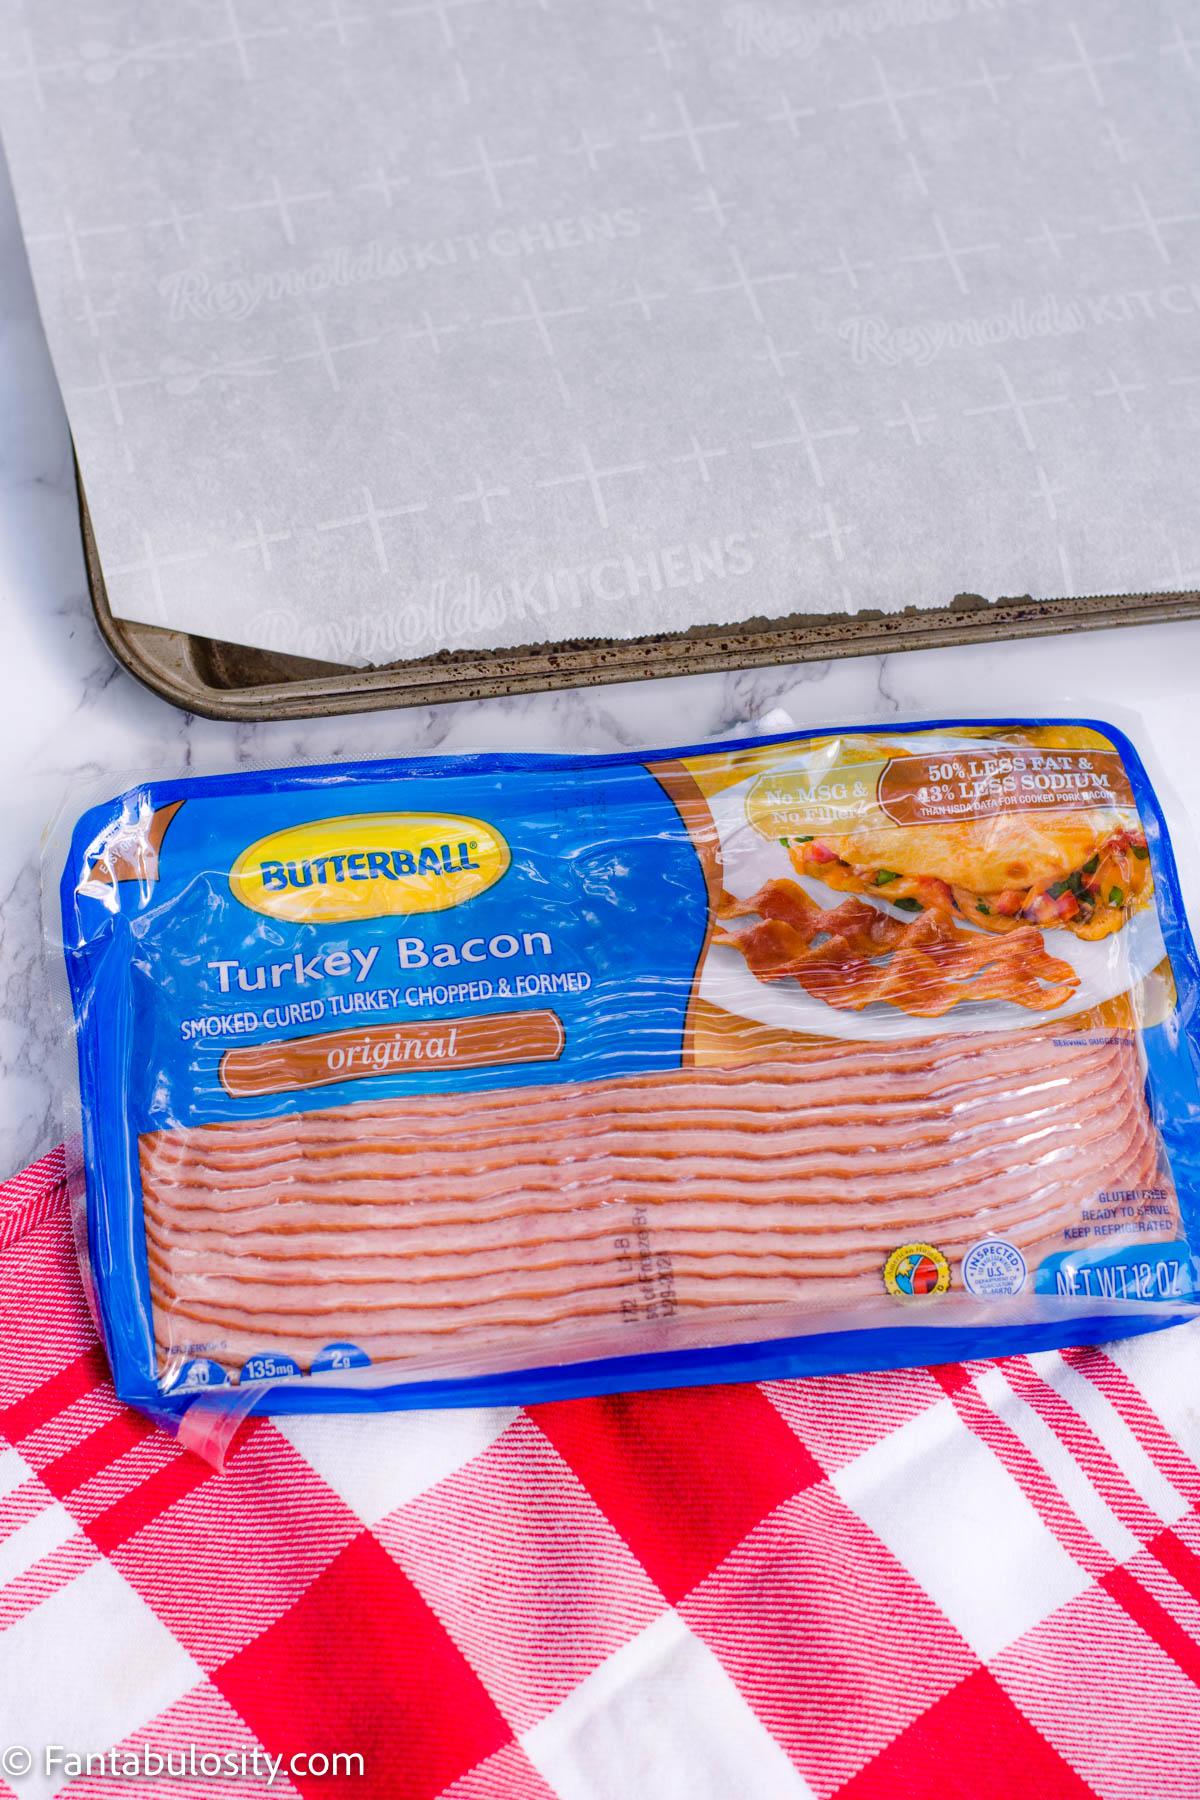 Butterball Turkey Bacon in Package